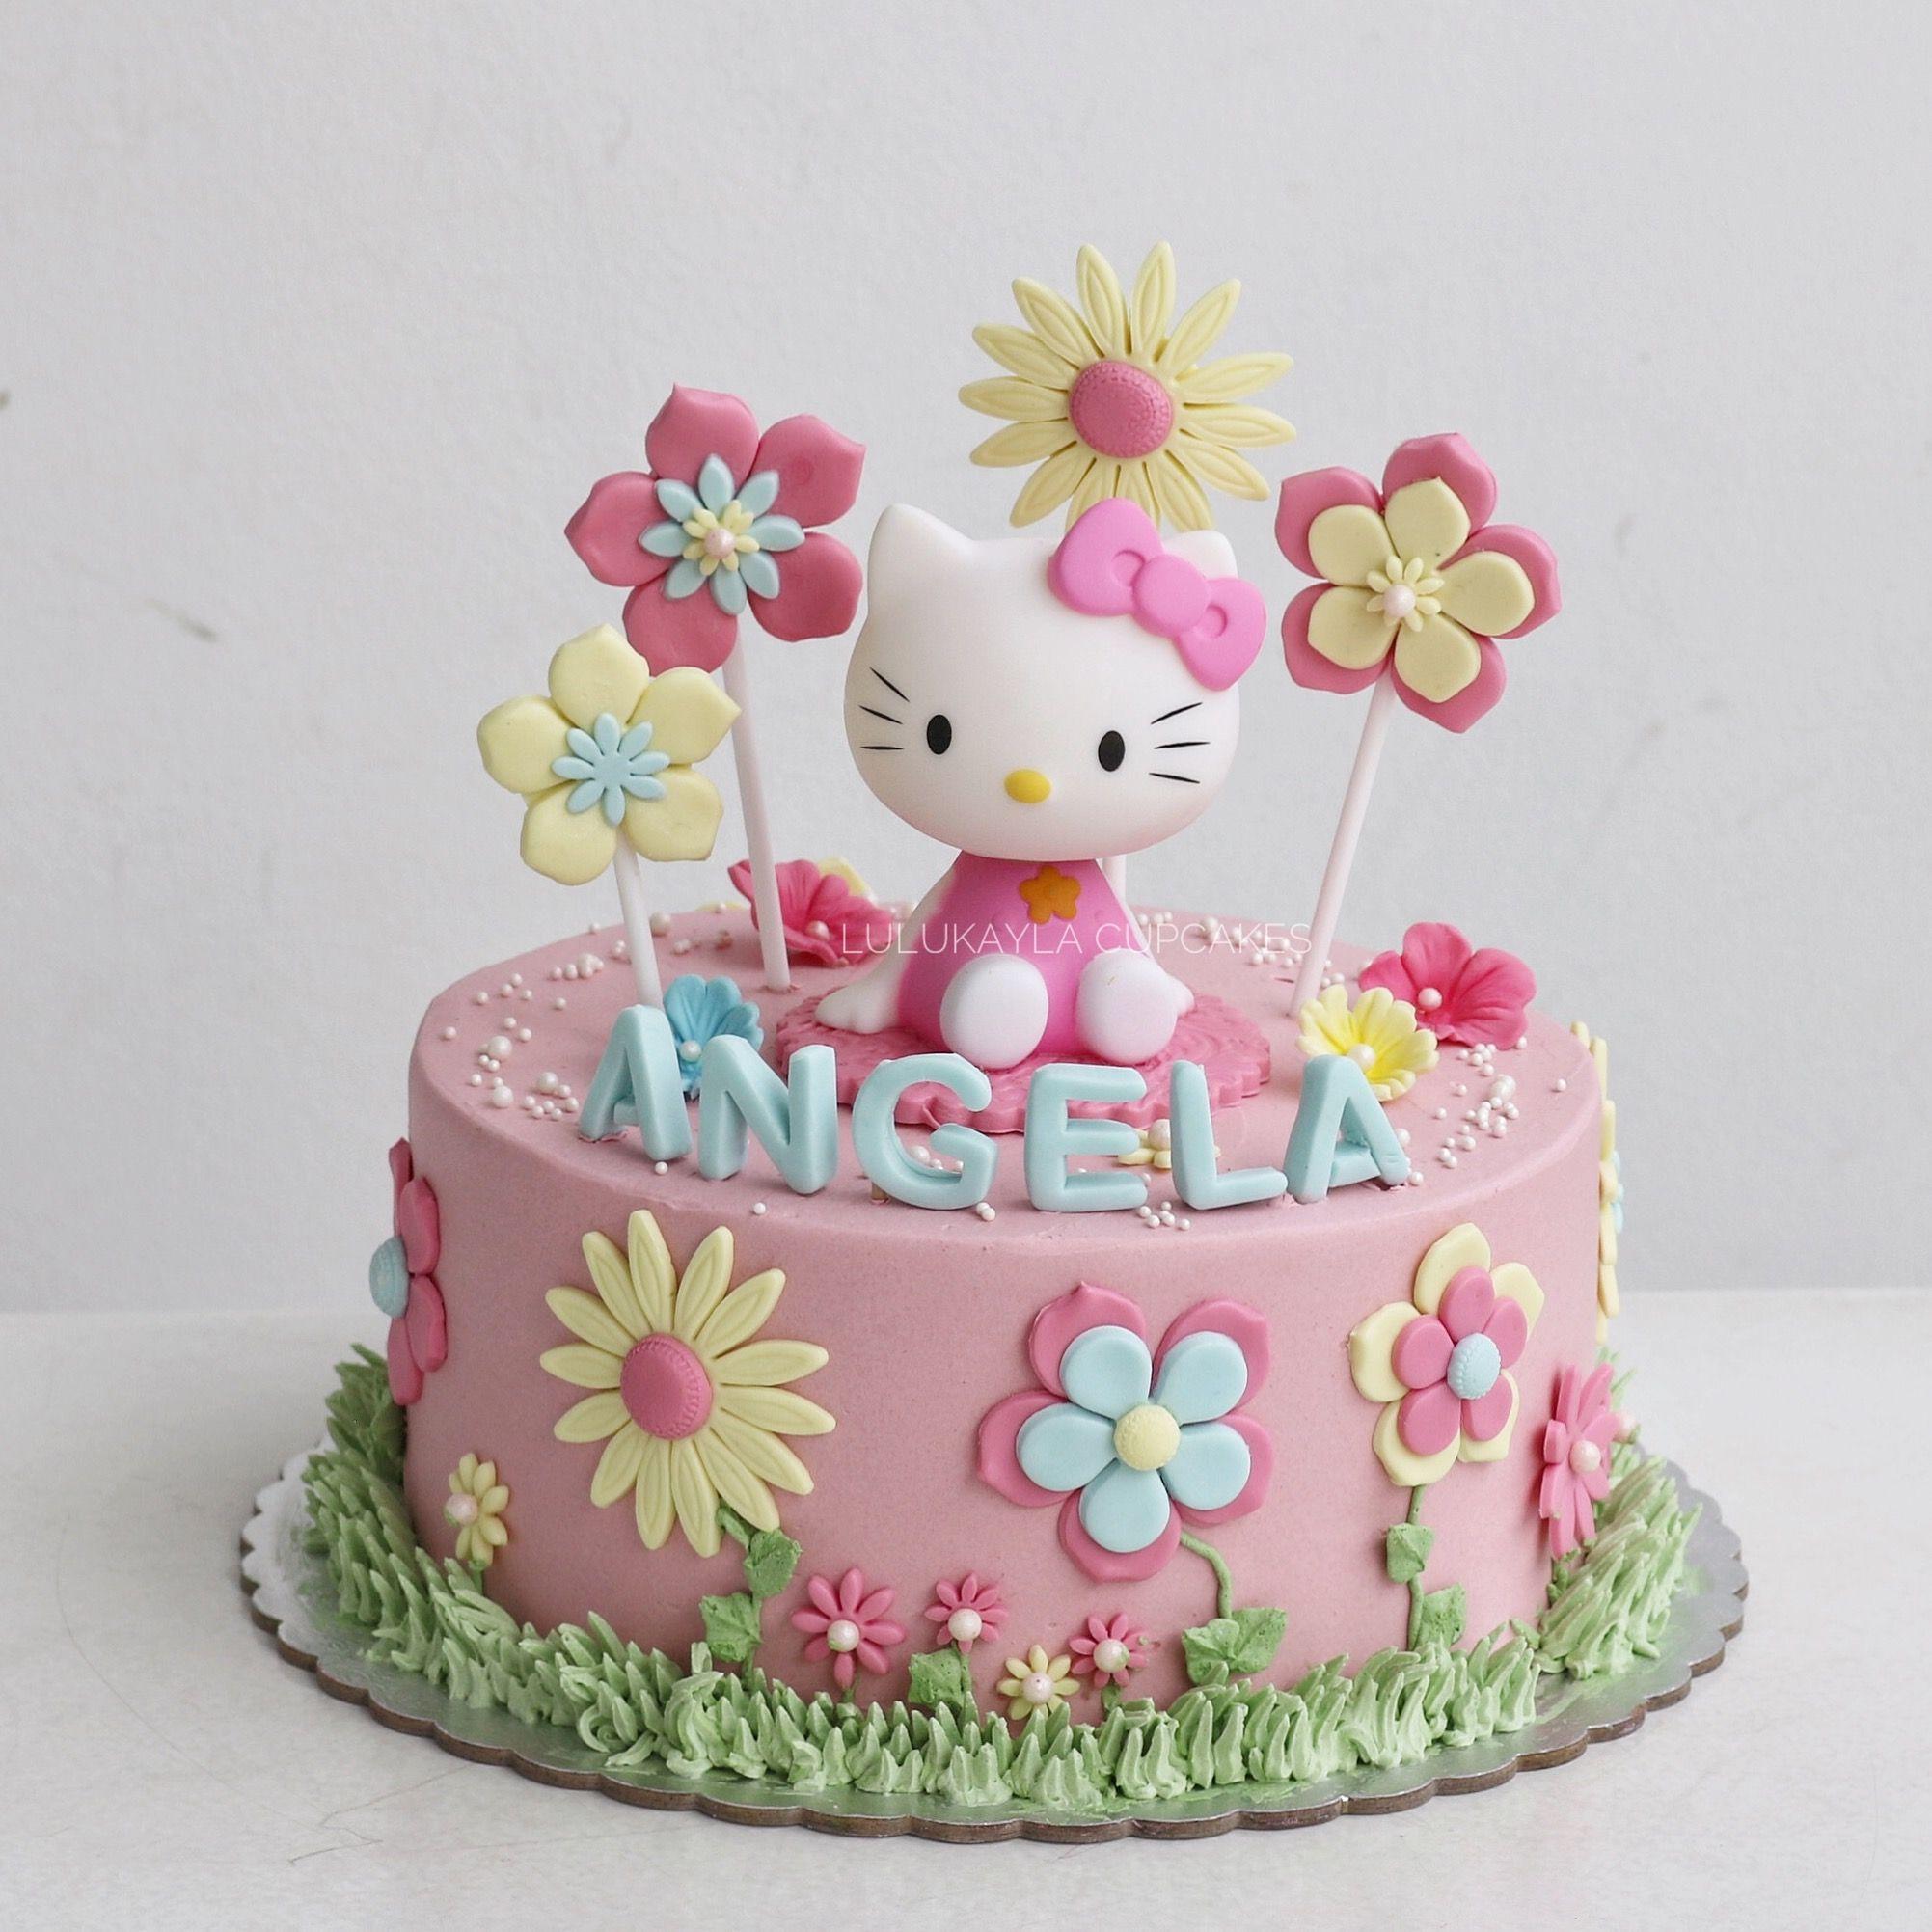 Hello Kitty Cake Hello Kitty Birthday Cake Hello Kitty Birthday Party Ideas Cake Hello Kitty Cake